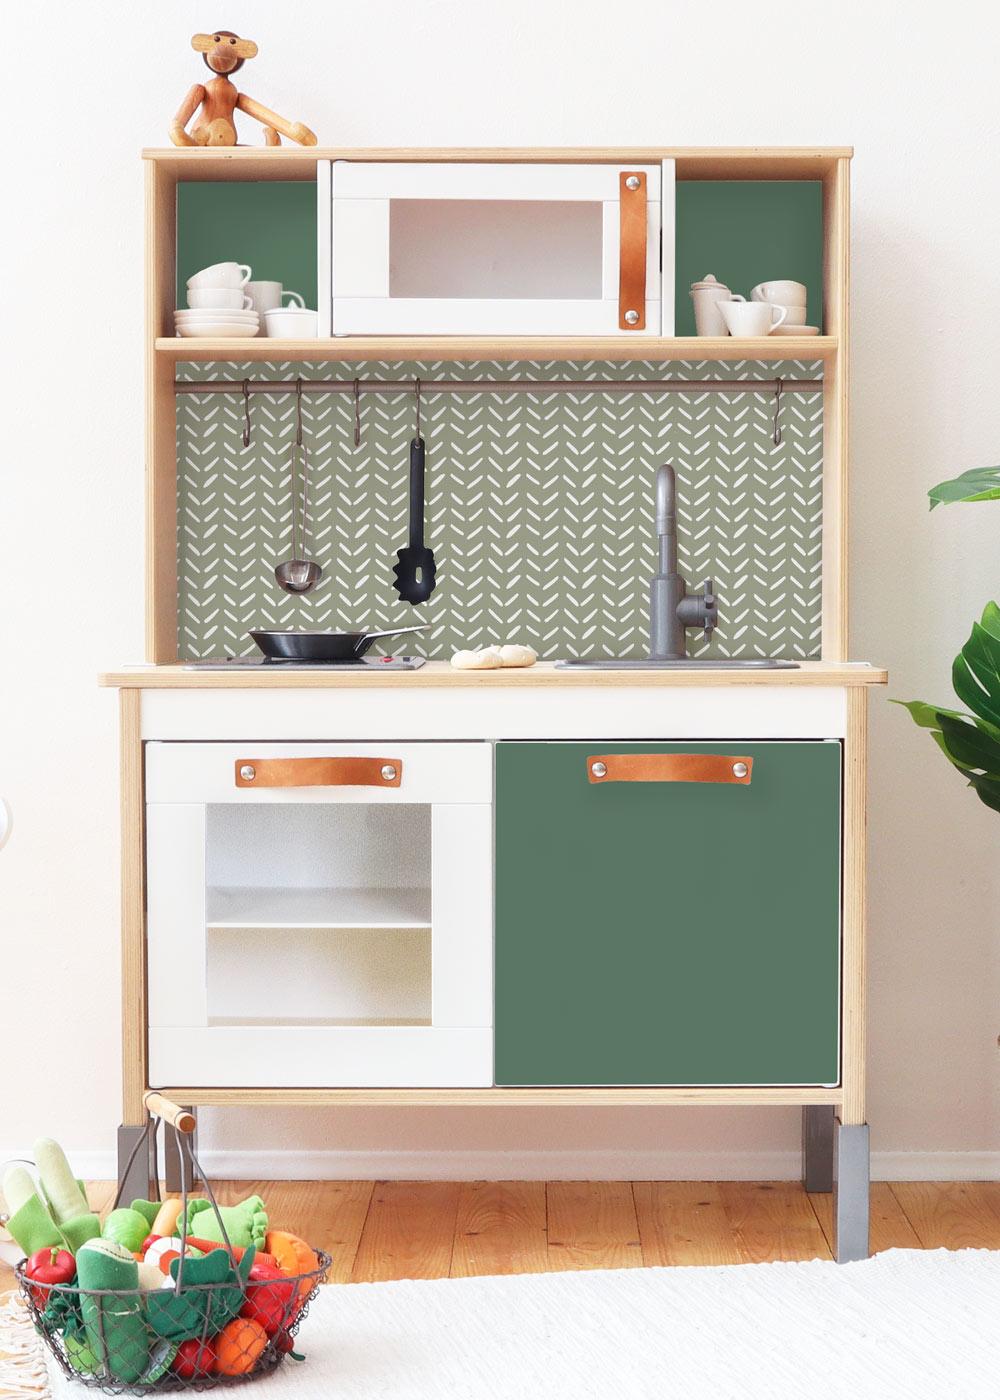 Ikea Duktig Kinderküche Waldig Immergrün